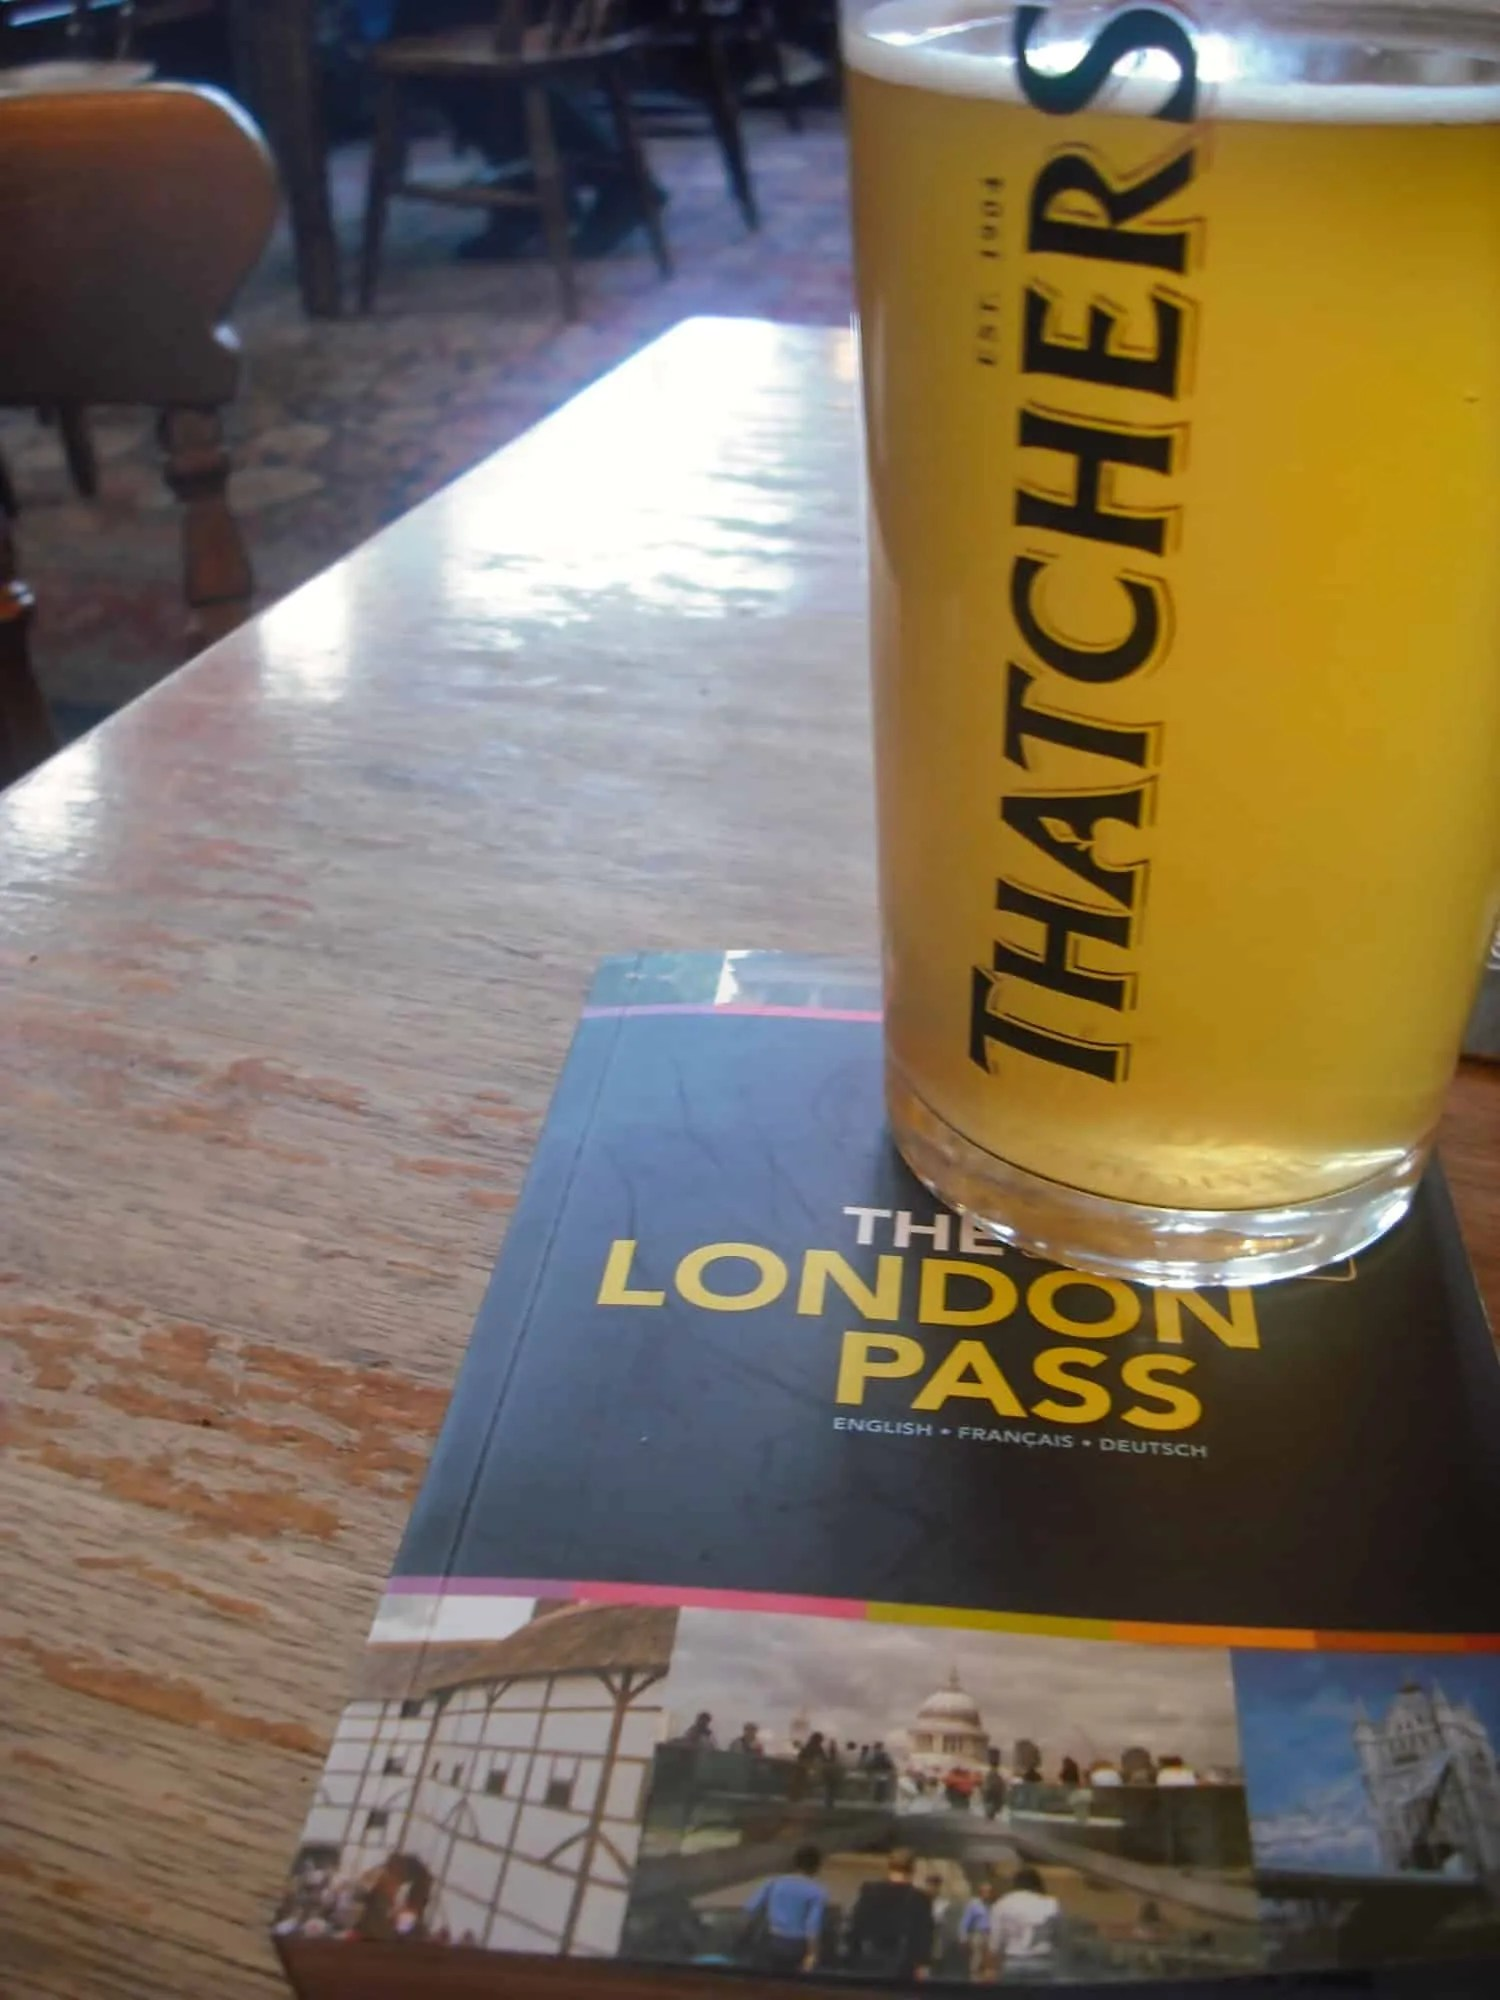 London Pass Review - Pint